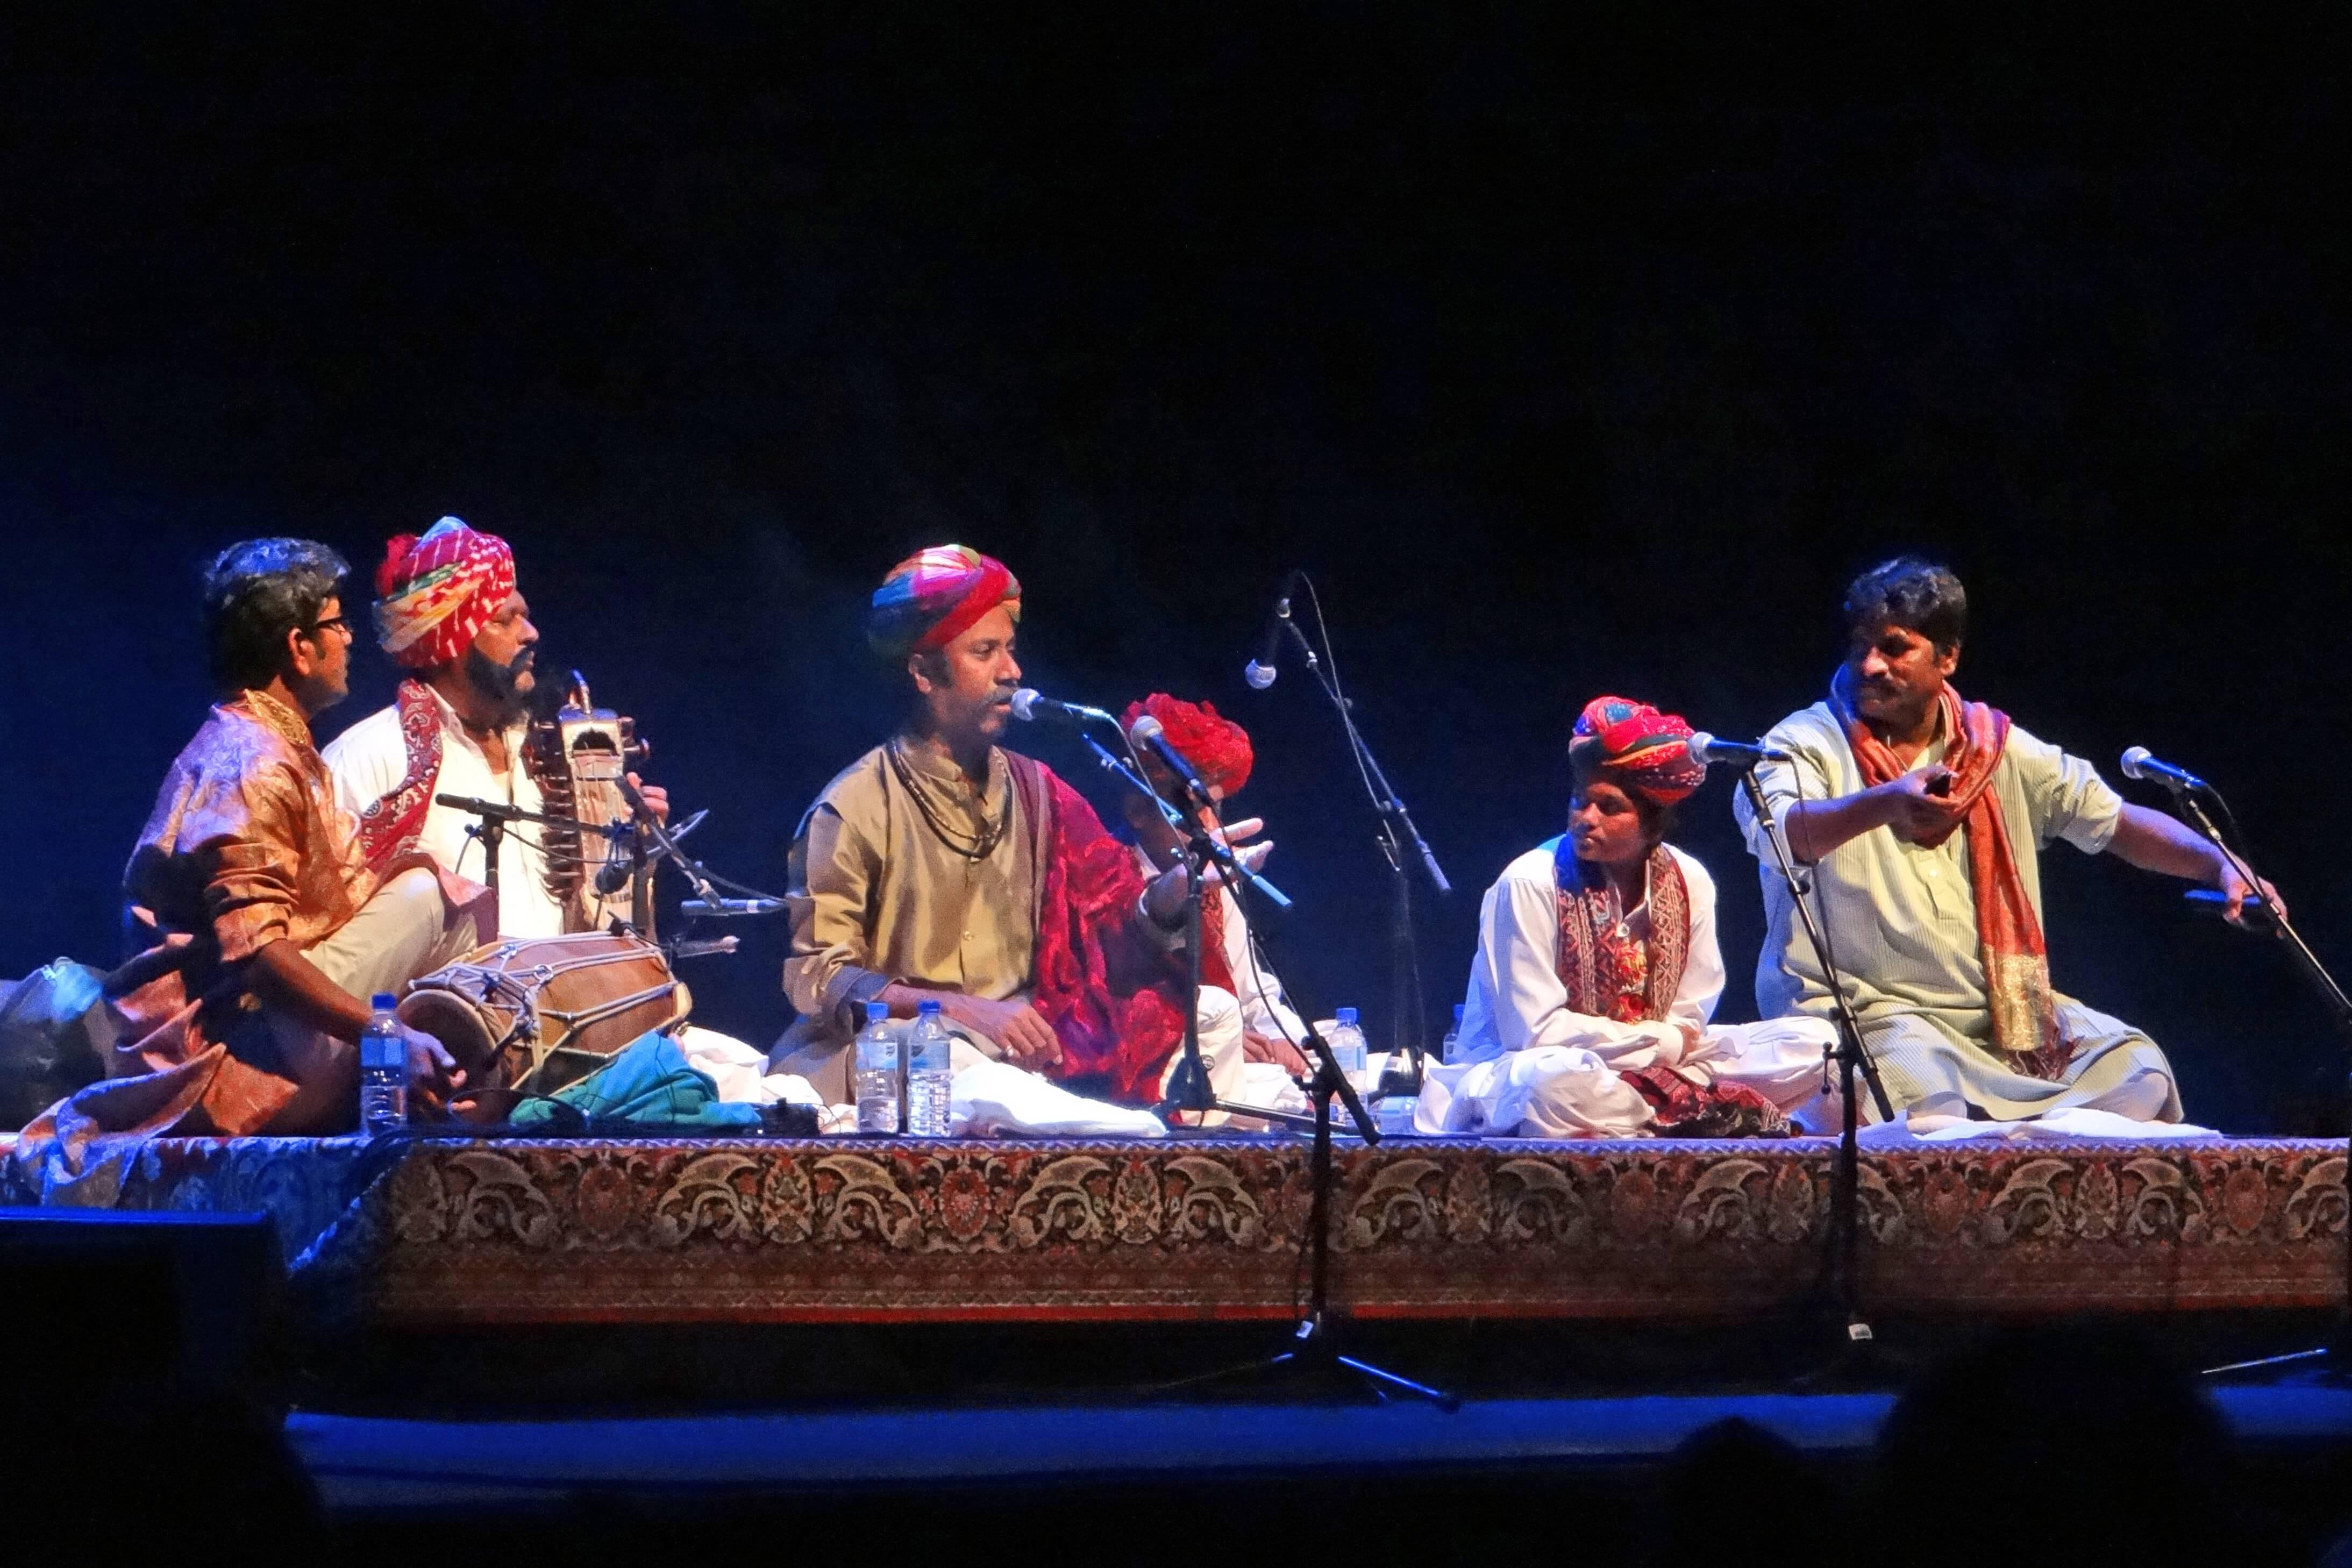 Rajasthan Music Festival